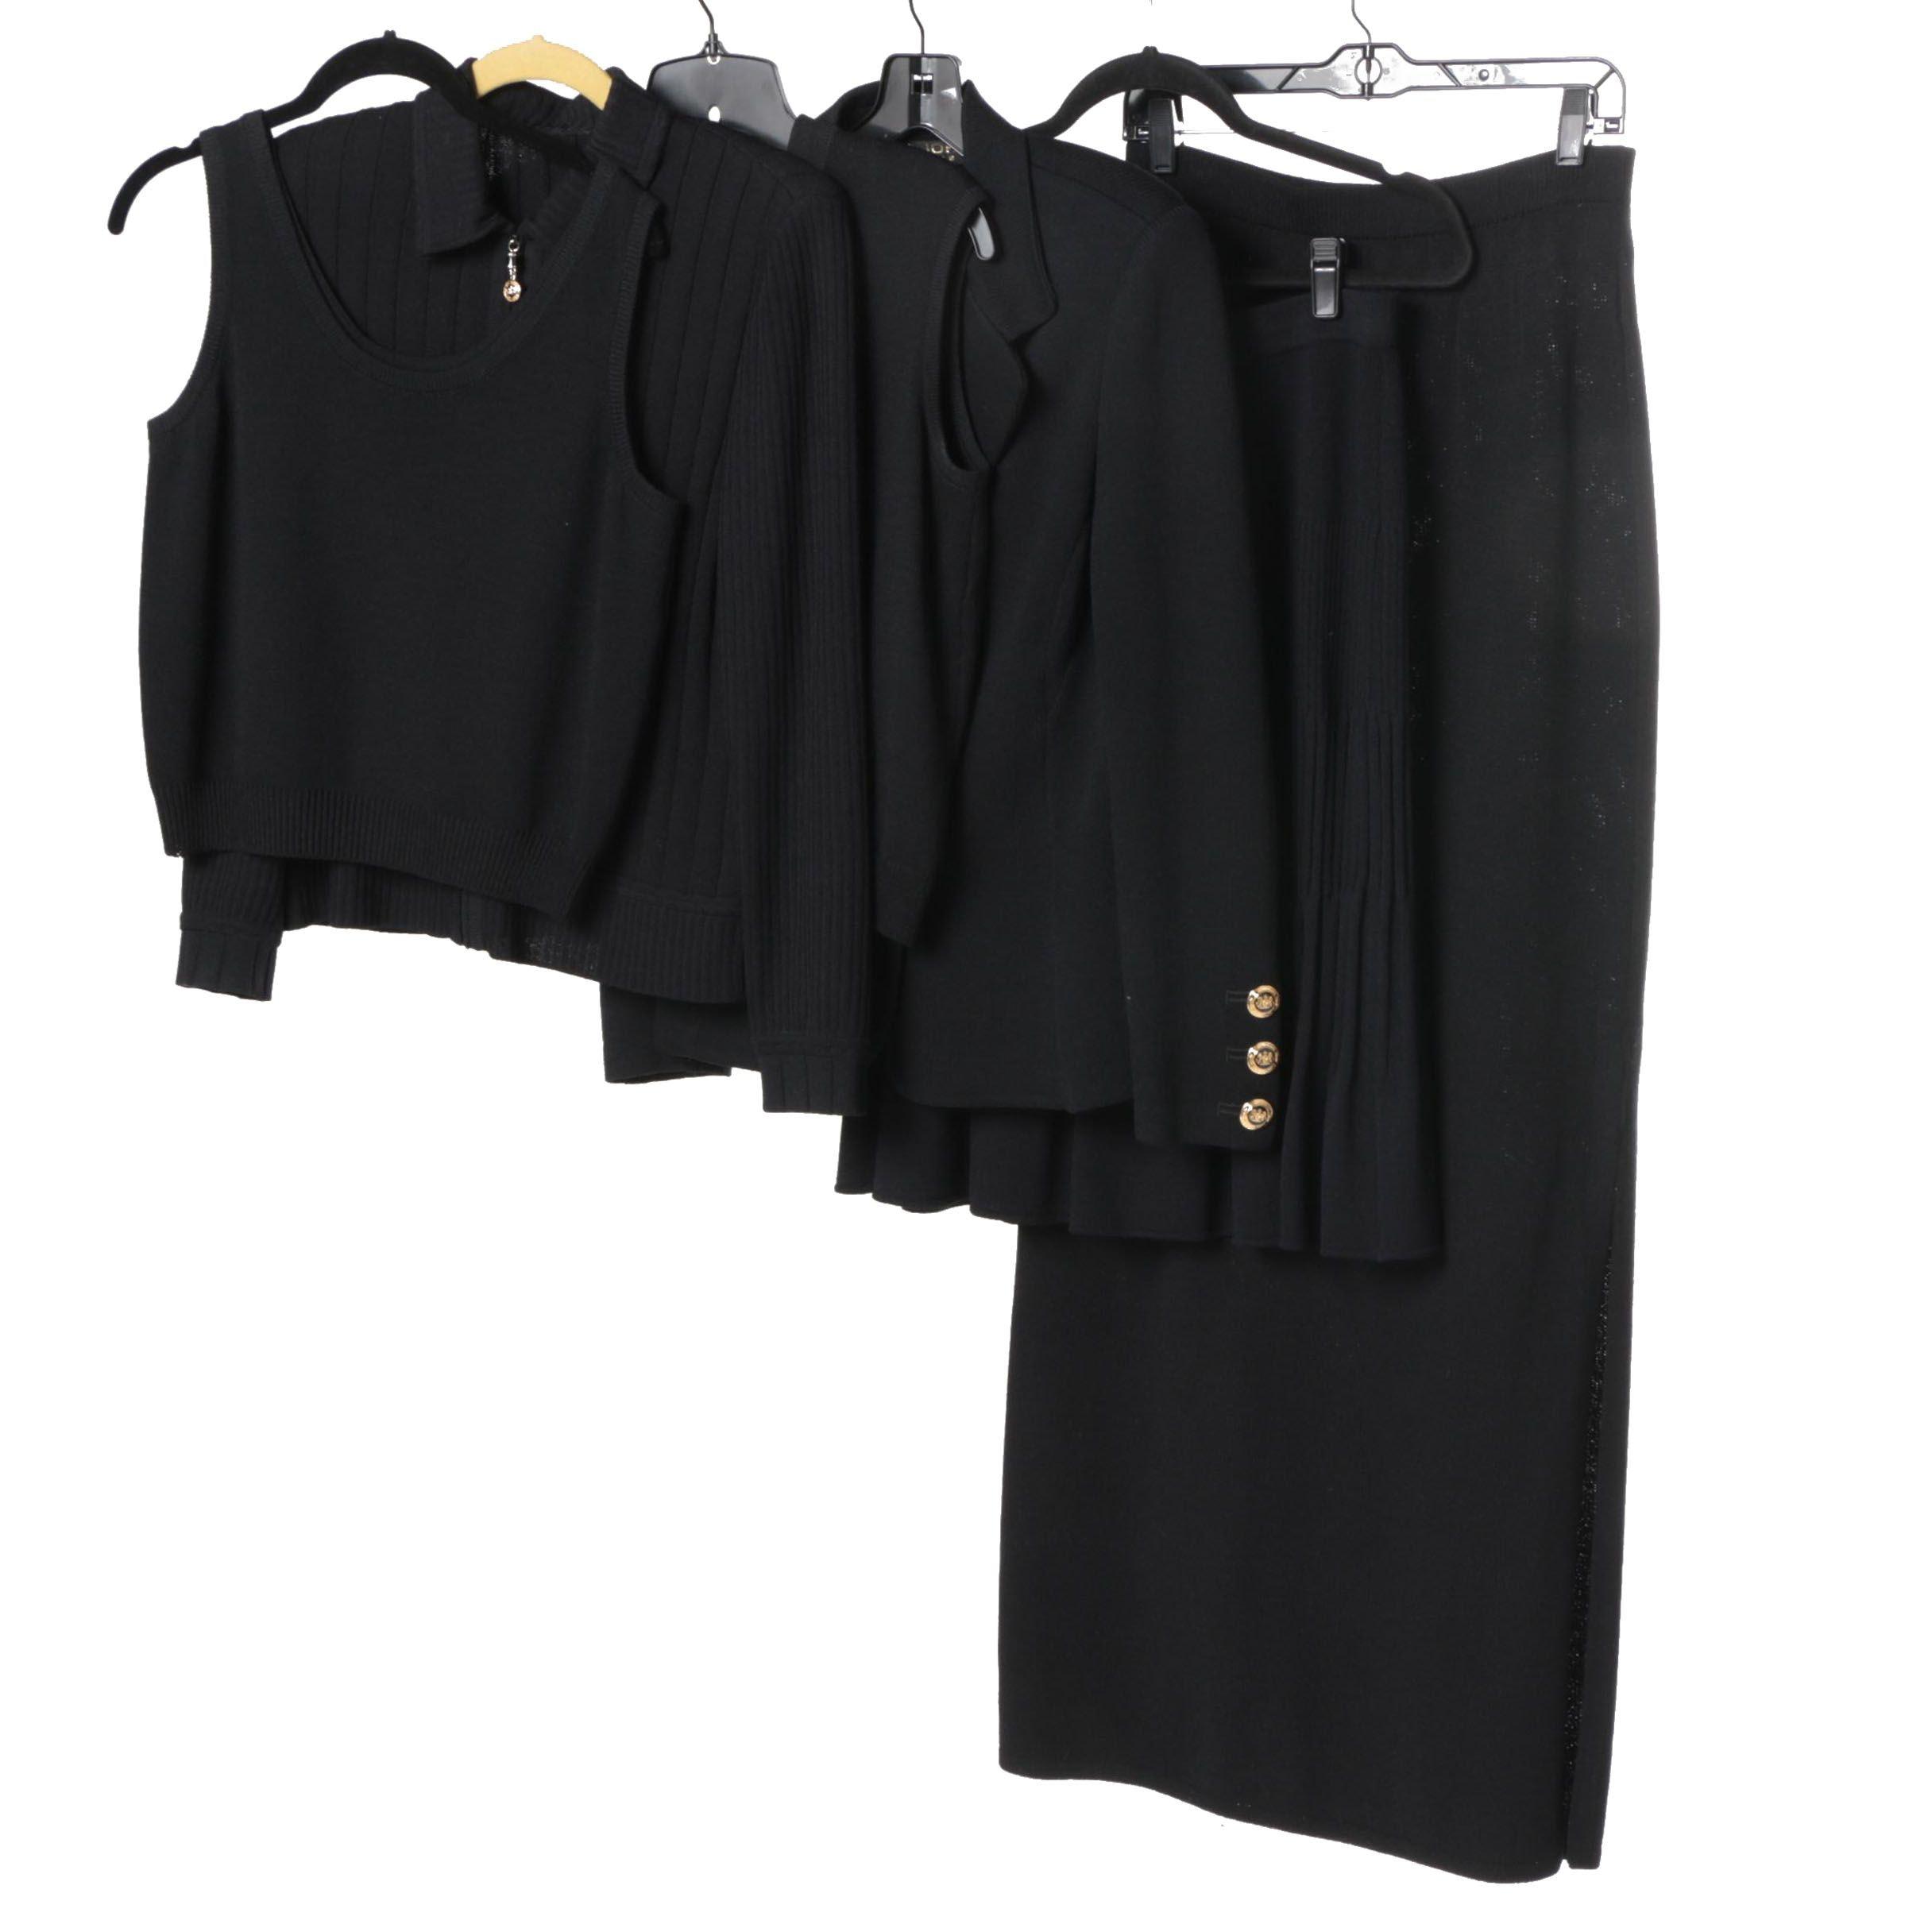 Women's Knit St. John Collection and St. John Basics Clothing